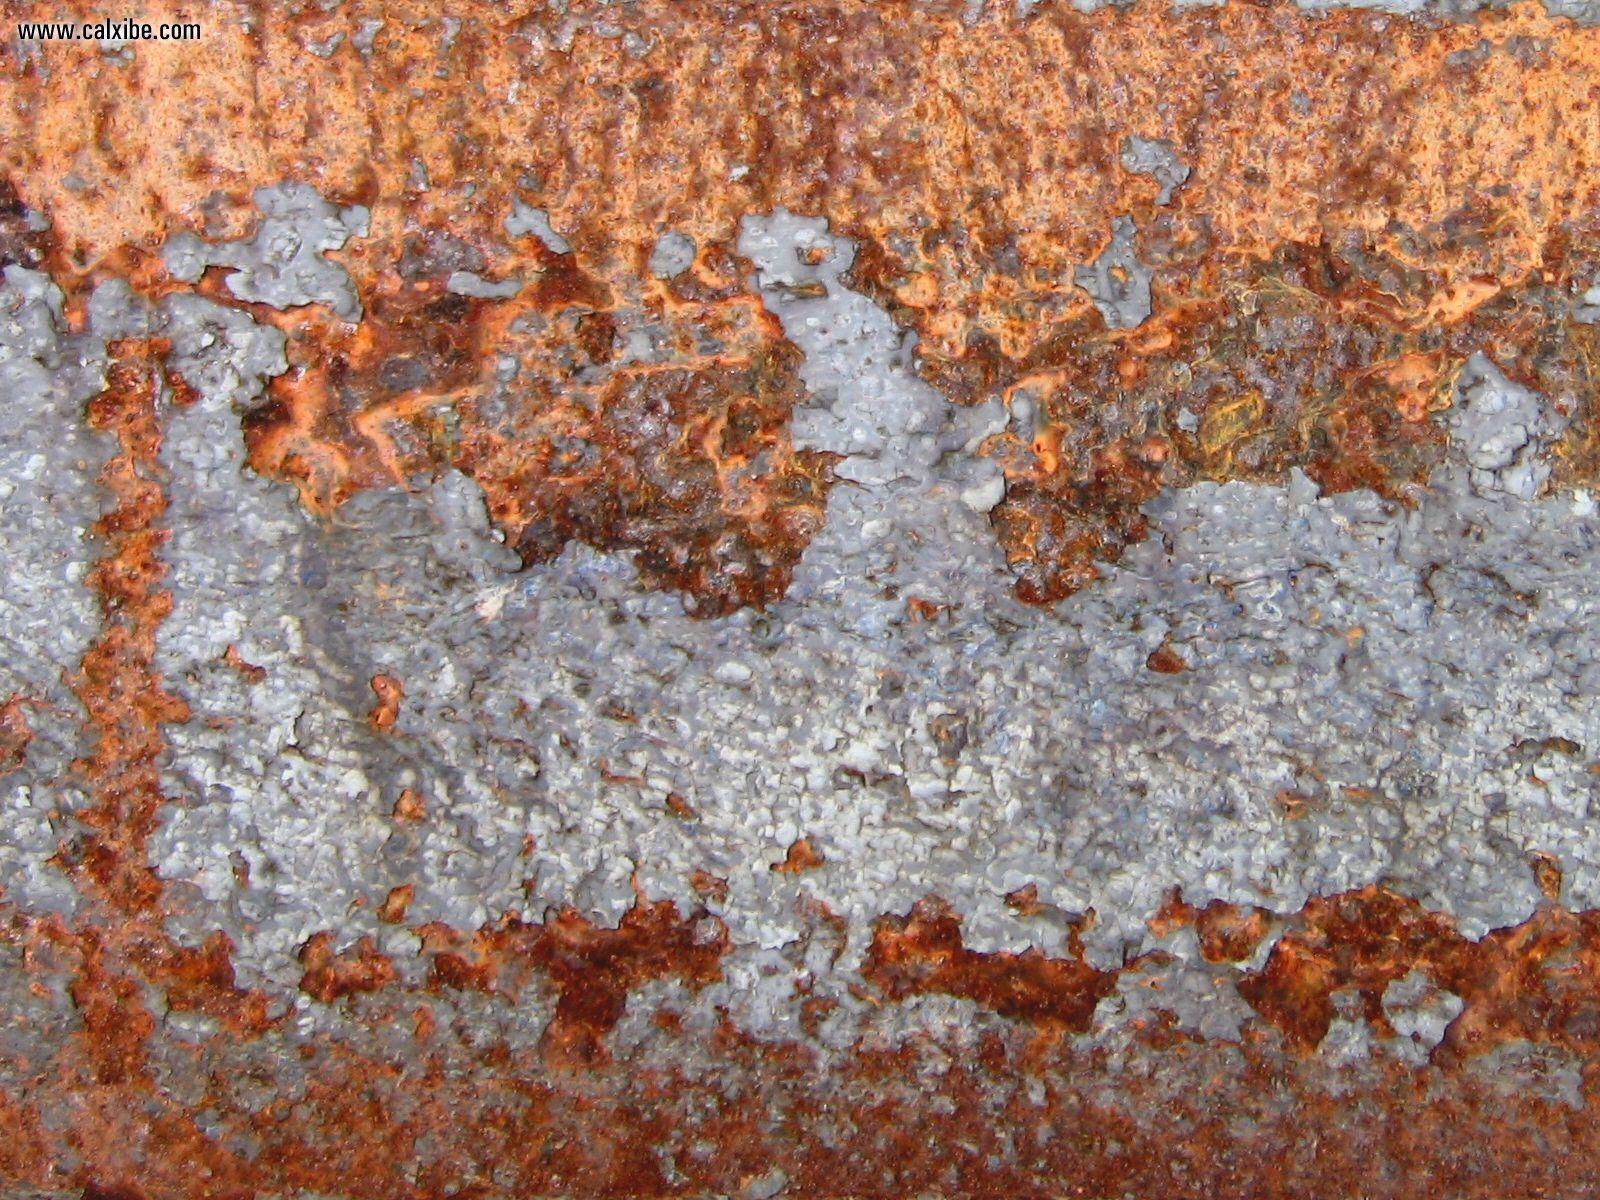 Development Rusty Metal picture nr 15951 1600x1200